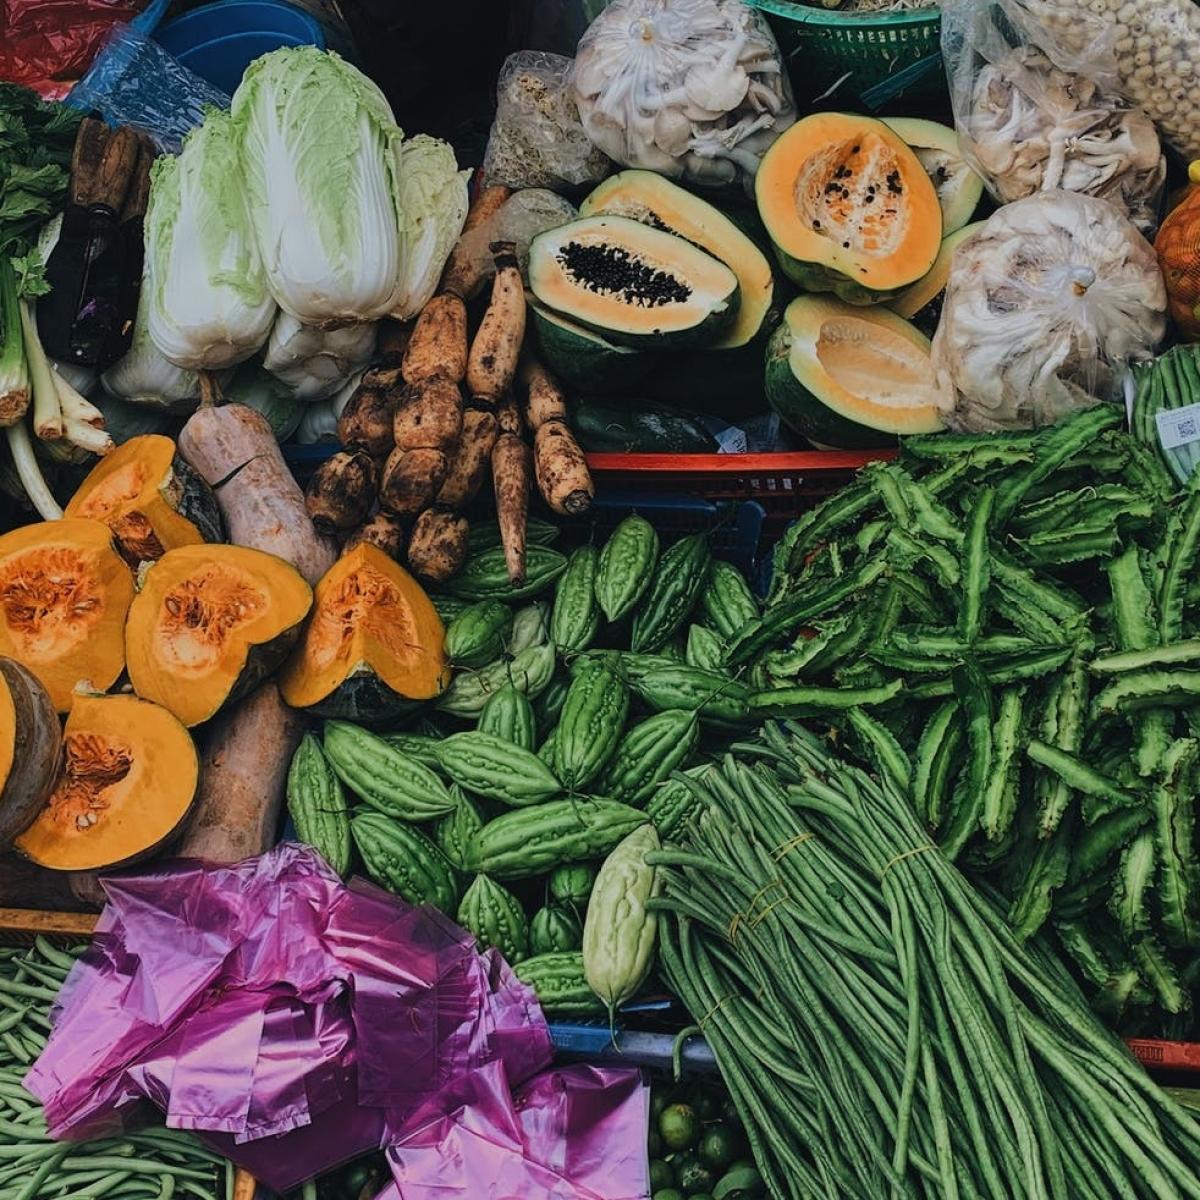 Madhya Pradesh: FDA launches 'Eat Right' campaign to monitor public health amid pandemic